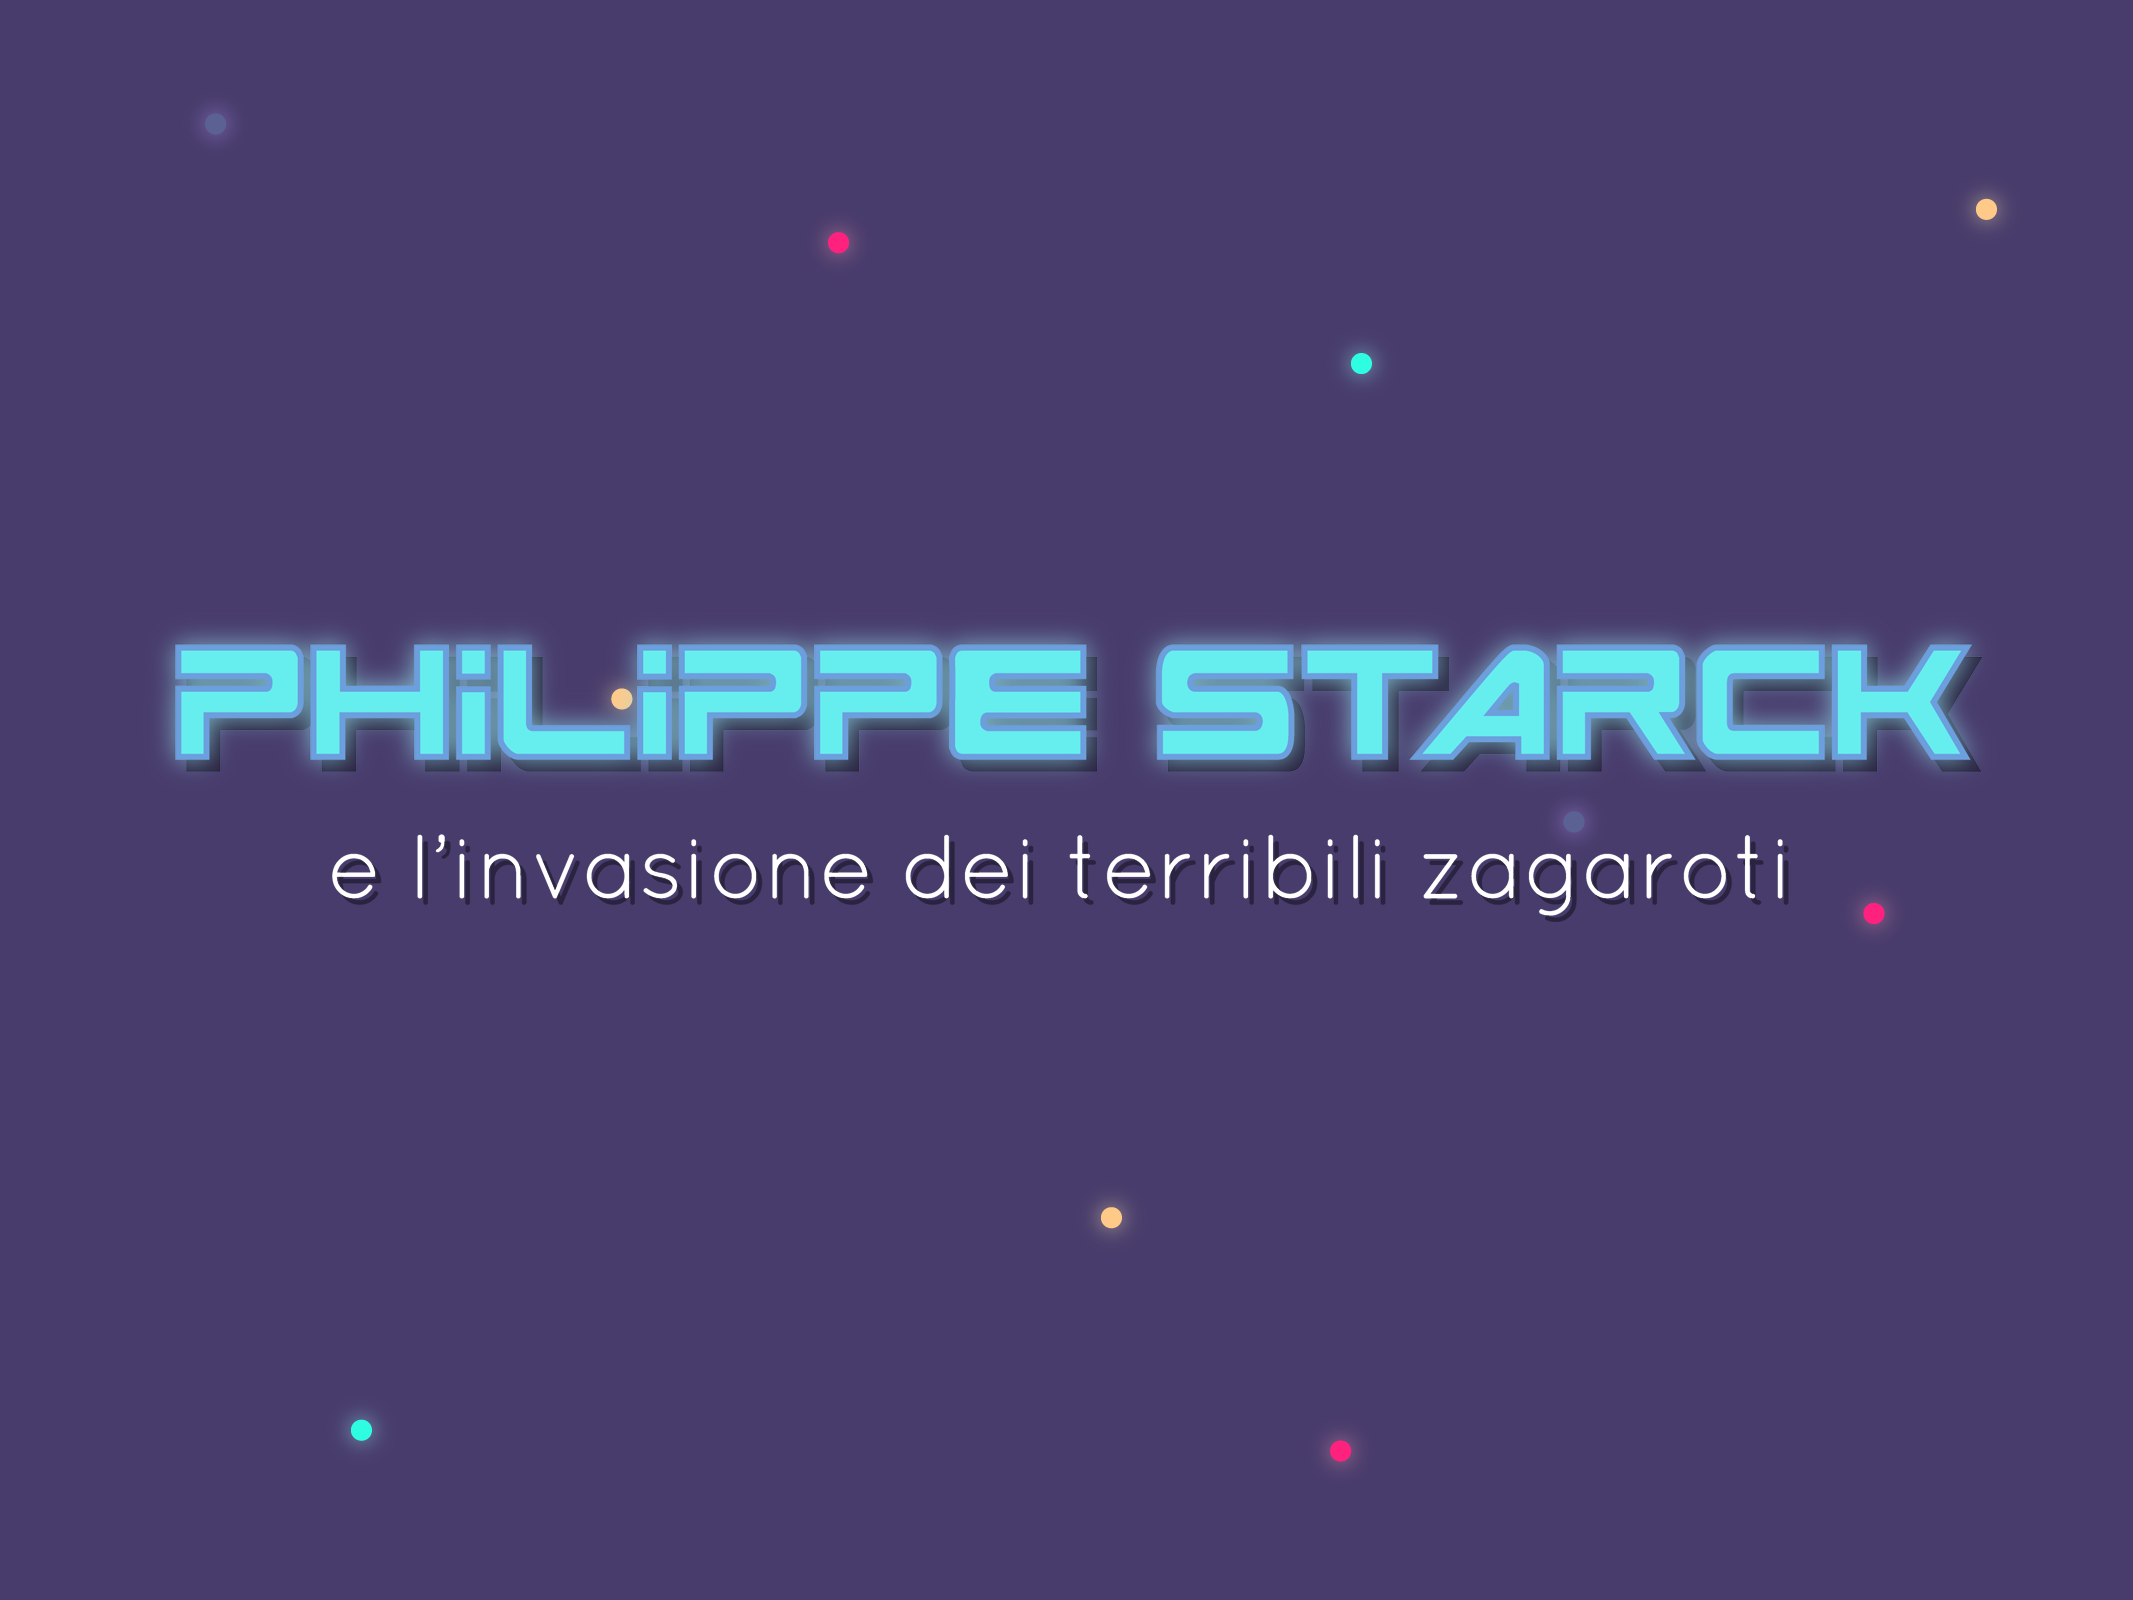 Philippe Starck e la minaccia dei terribili Zagaroti!